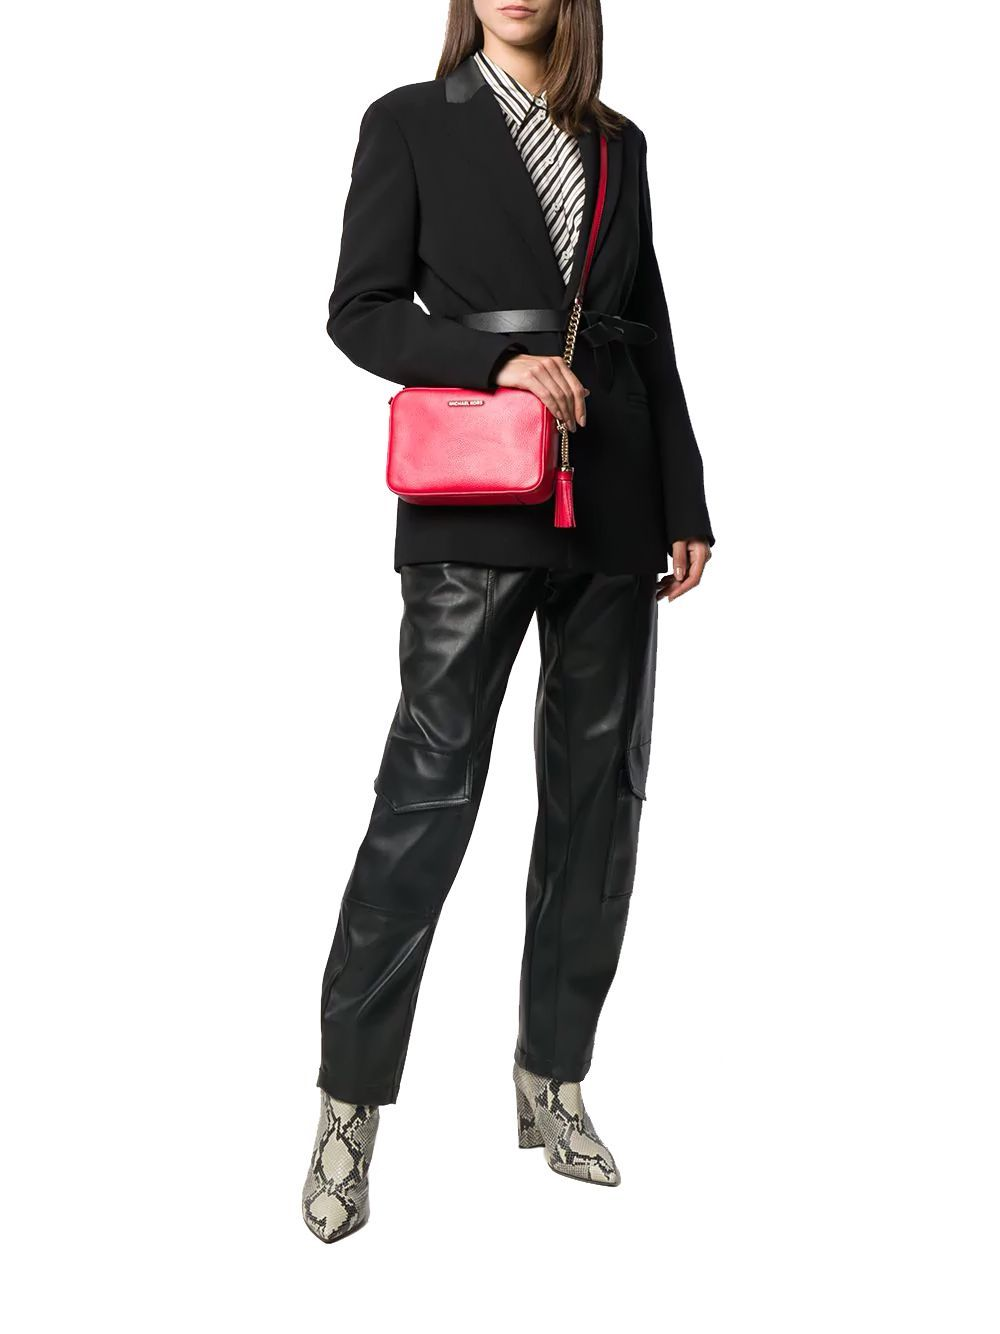 MICHAEL KORS WOMEN'S 32F7GGNM8L683 RED LEATHER SHOULDER BAG